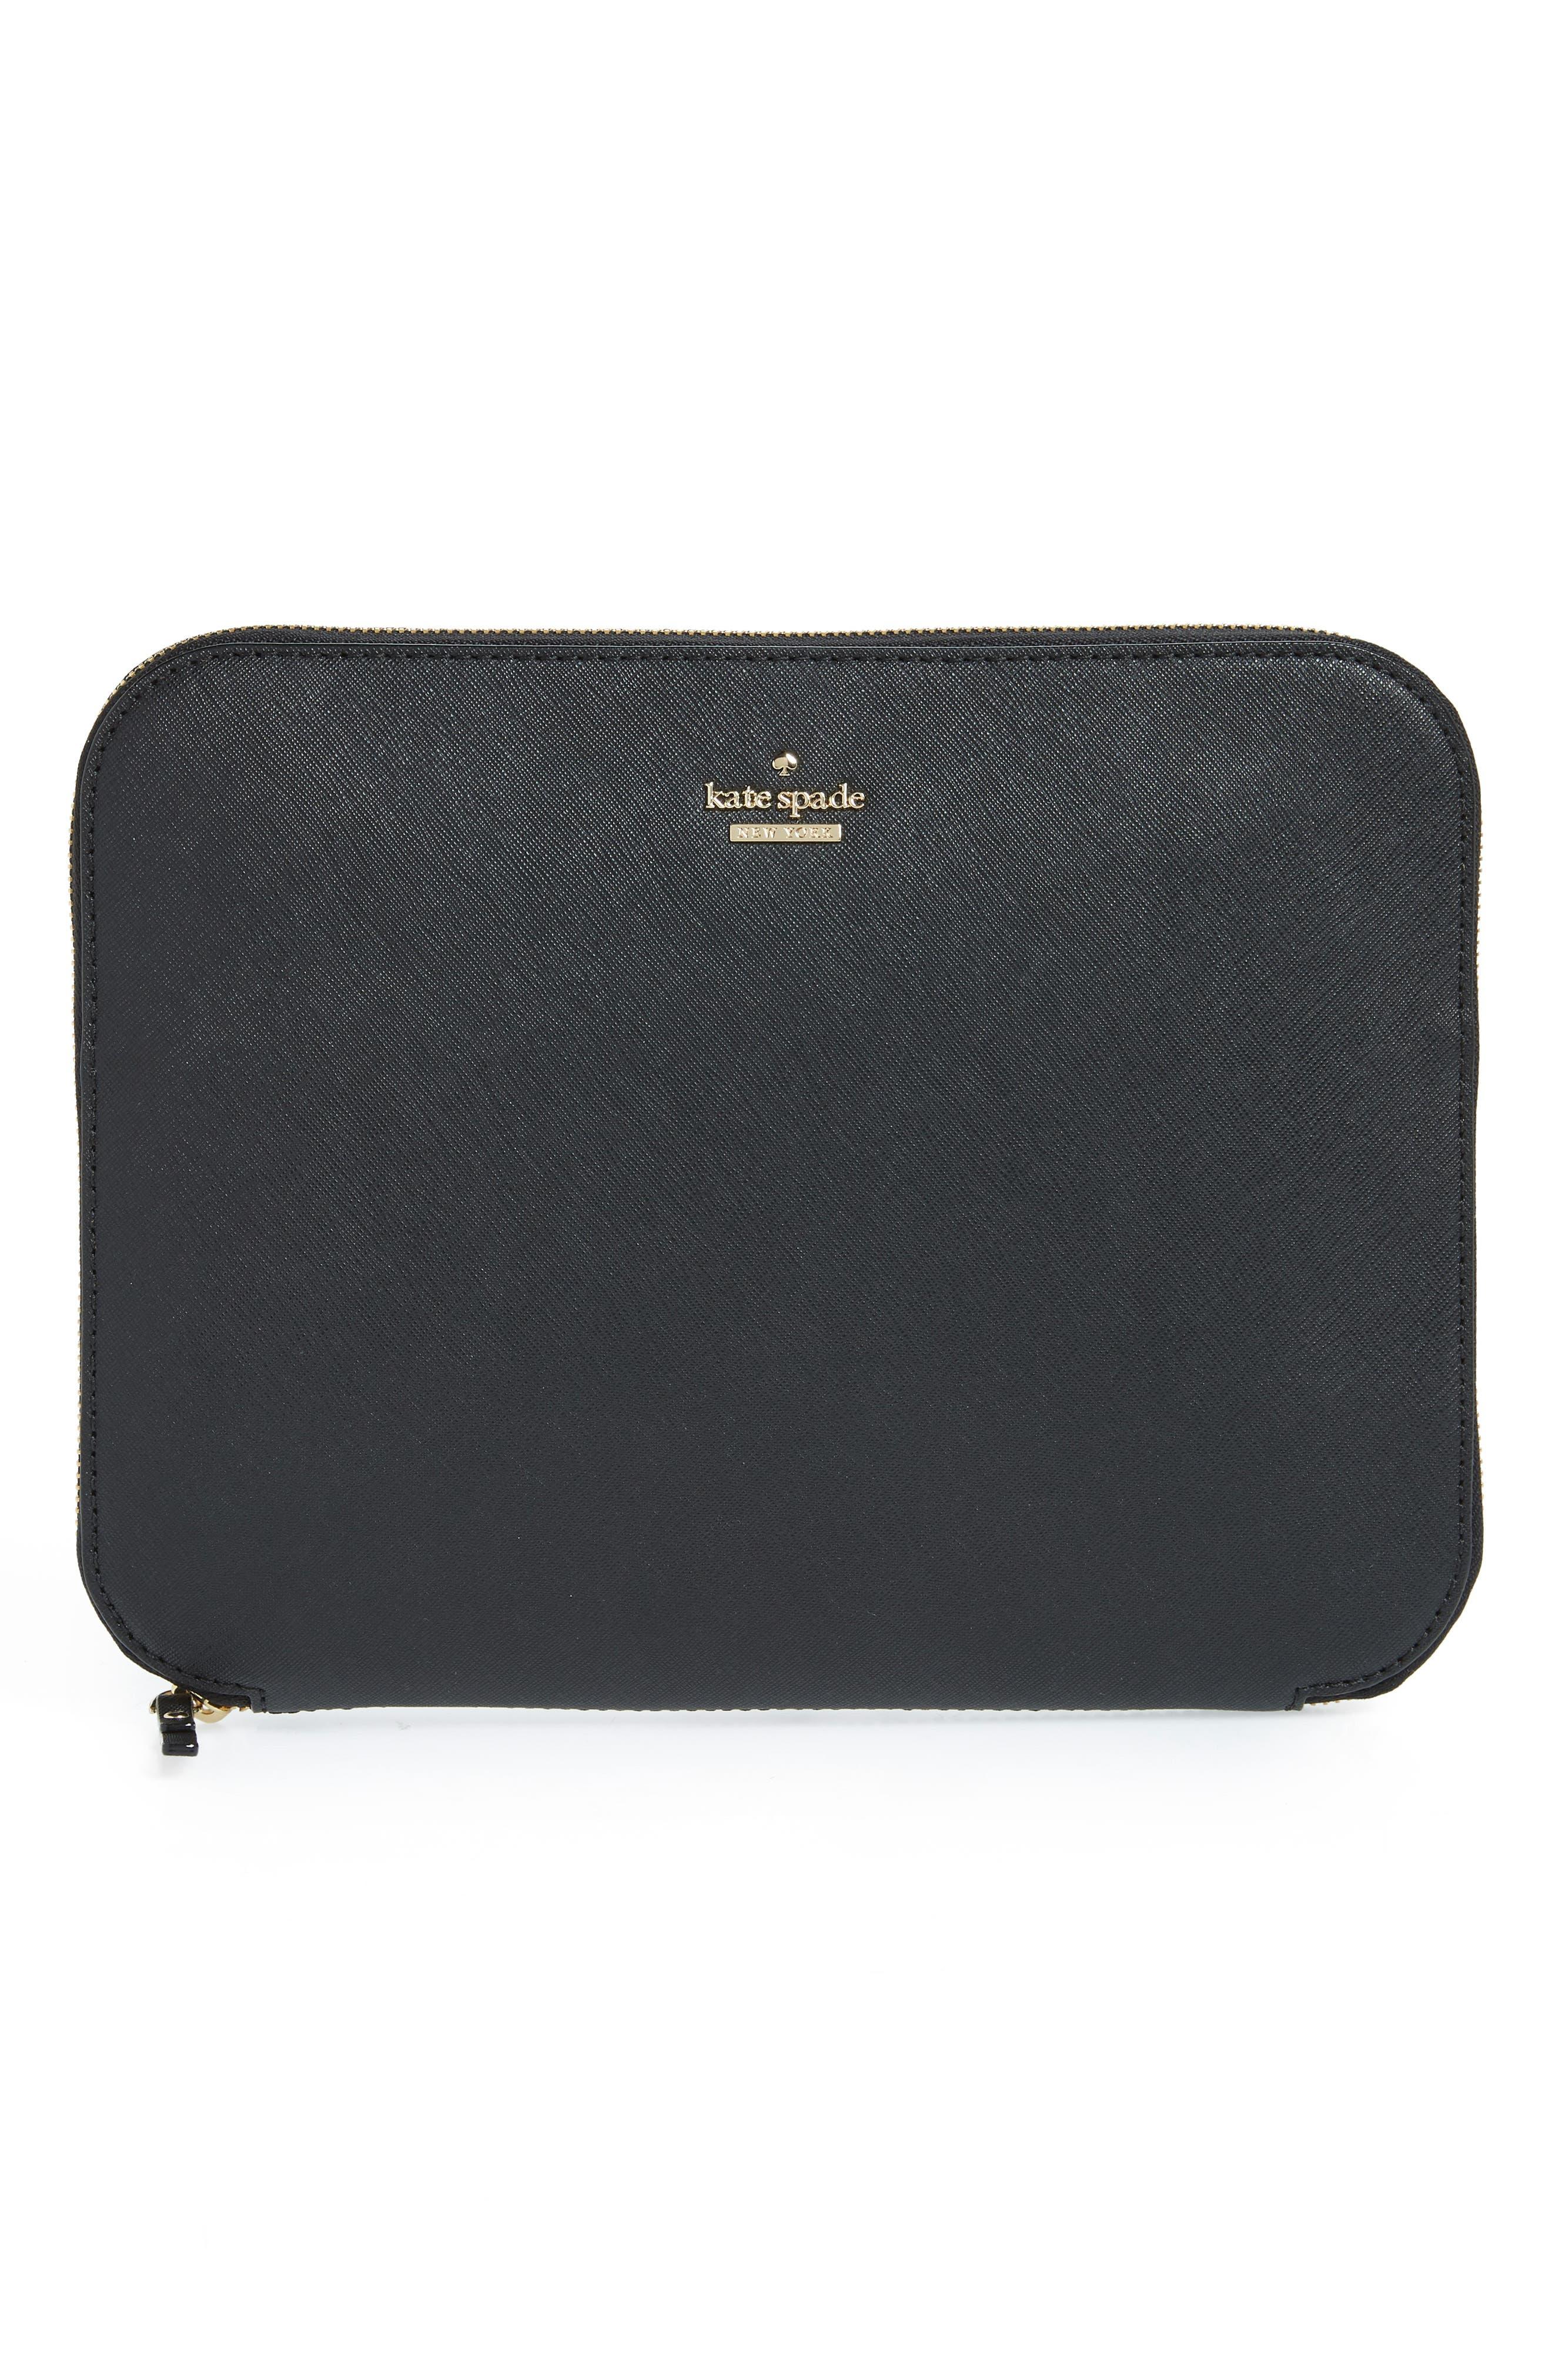 kate spade new york saffiano leather organization tablet sleeve